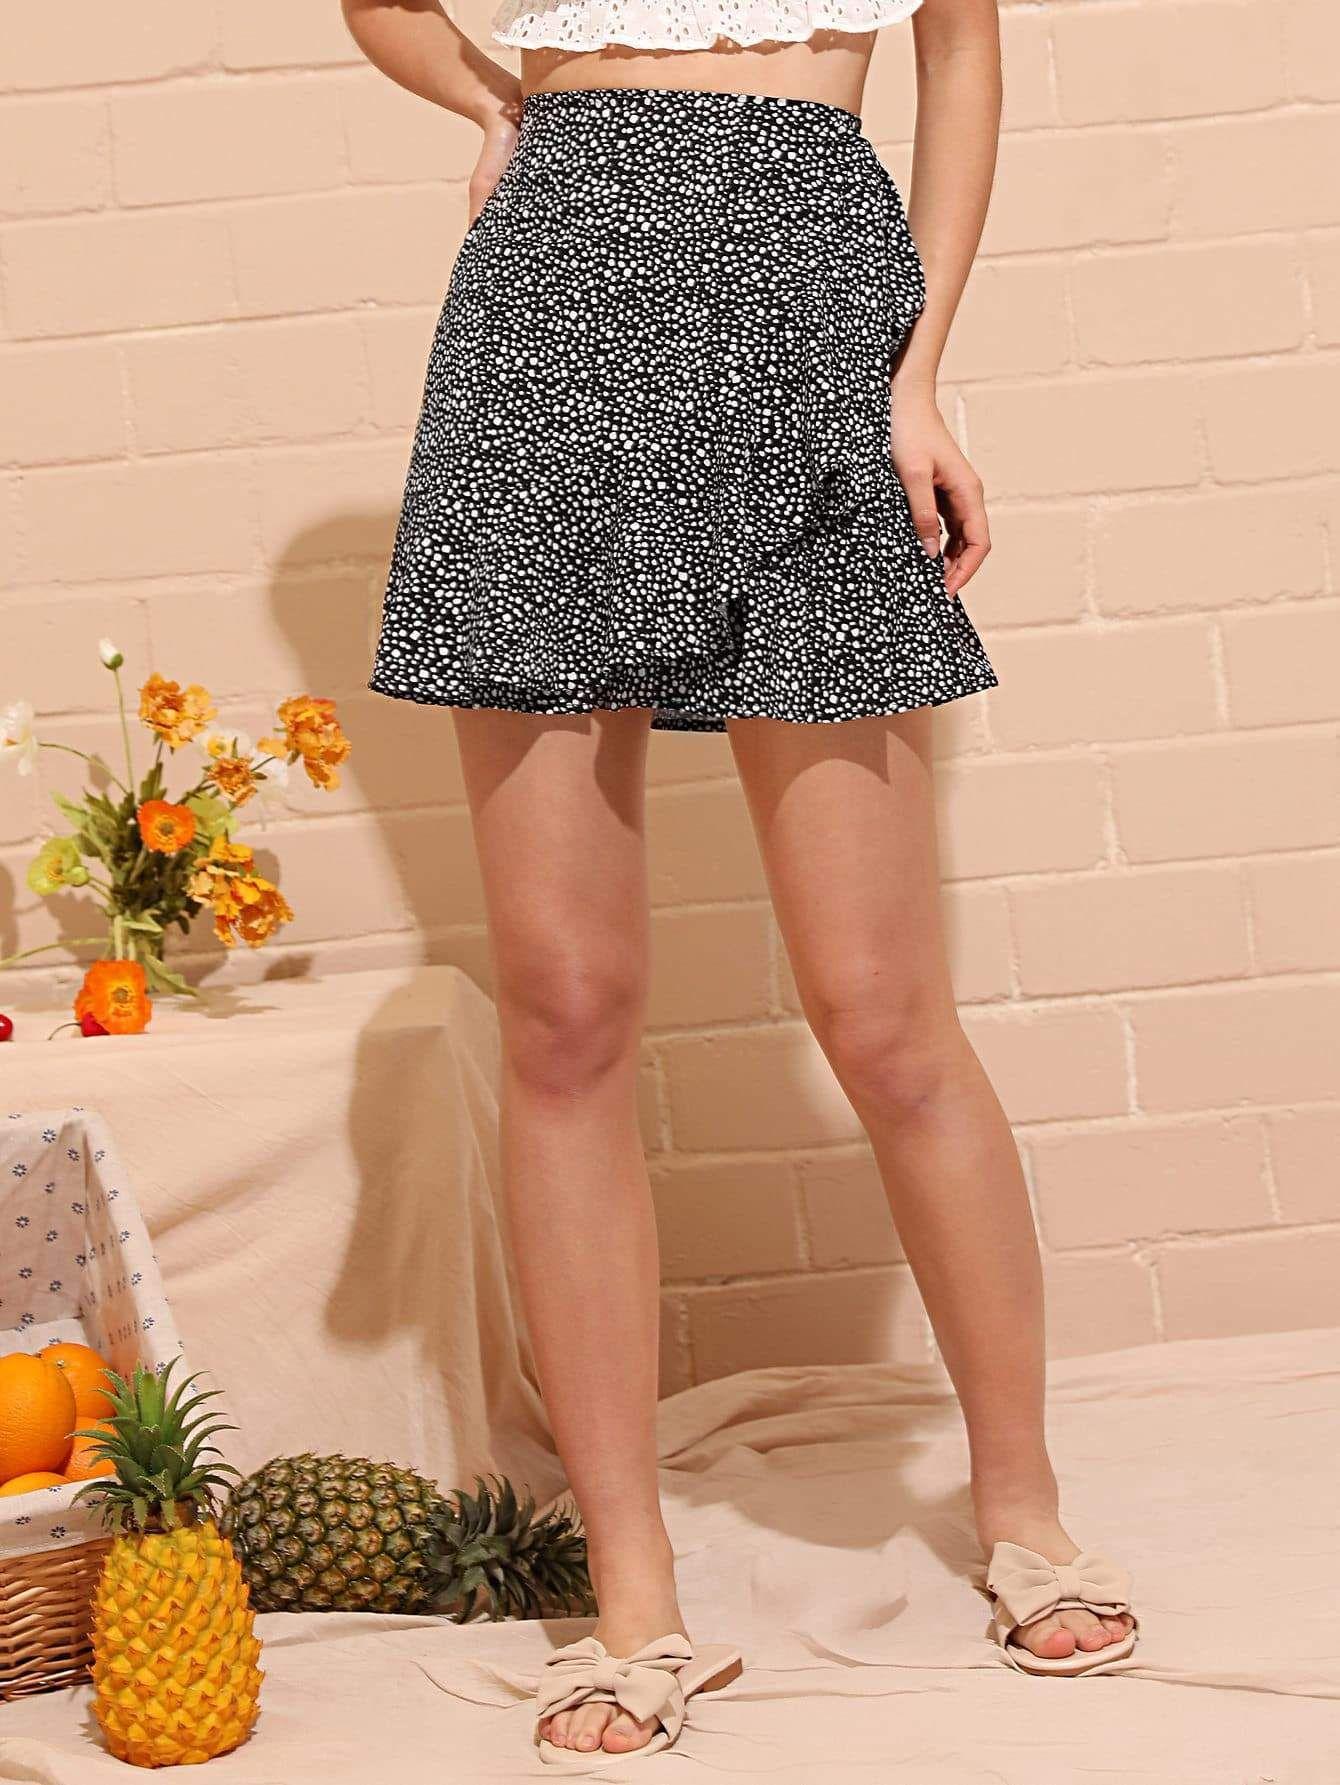 Dalmatian Print Ruffle Trim Skirt